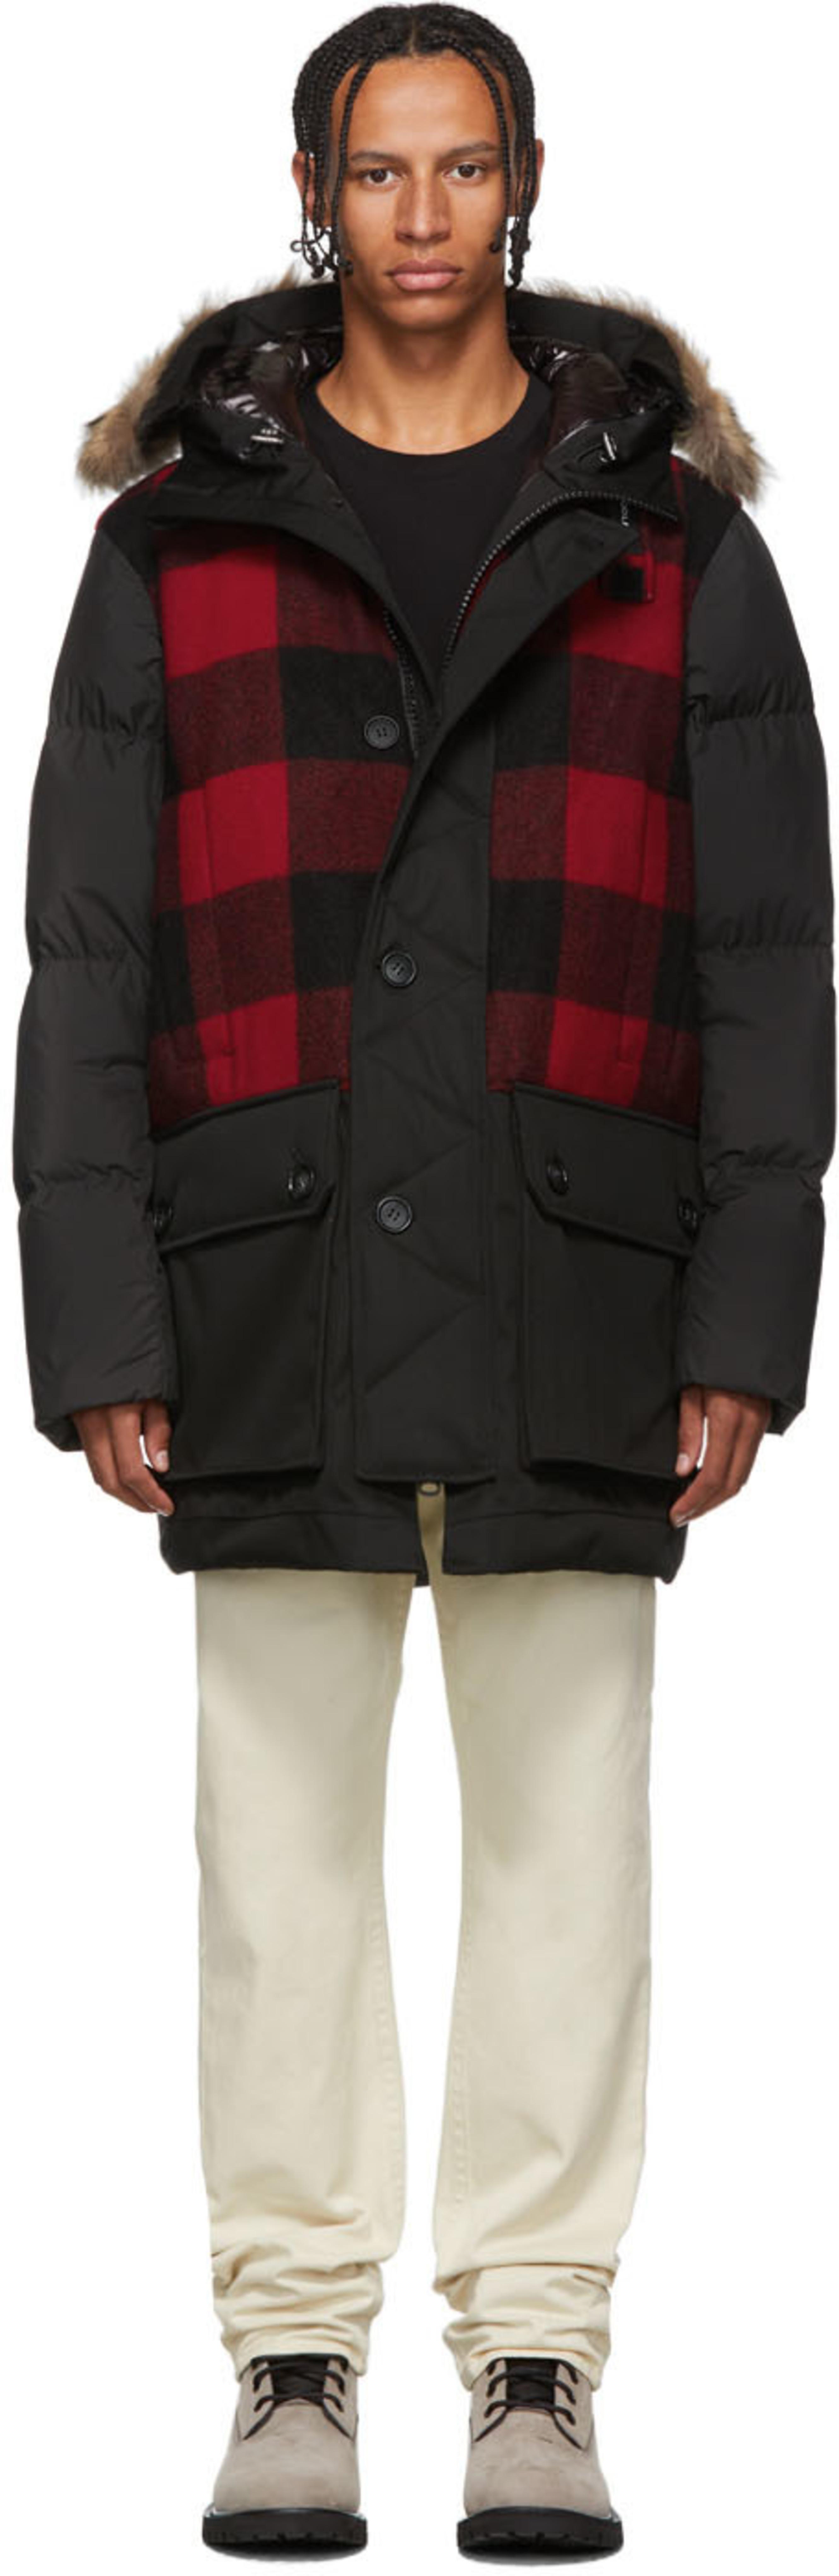 4897bb09e Black & Red Down Buffalo Wool Jacket